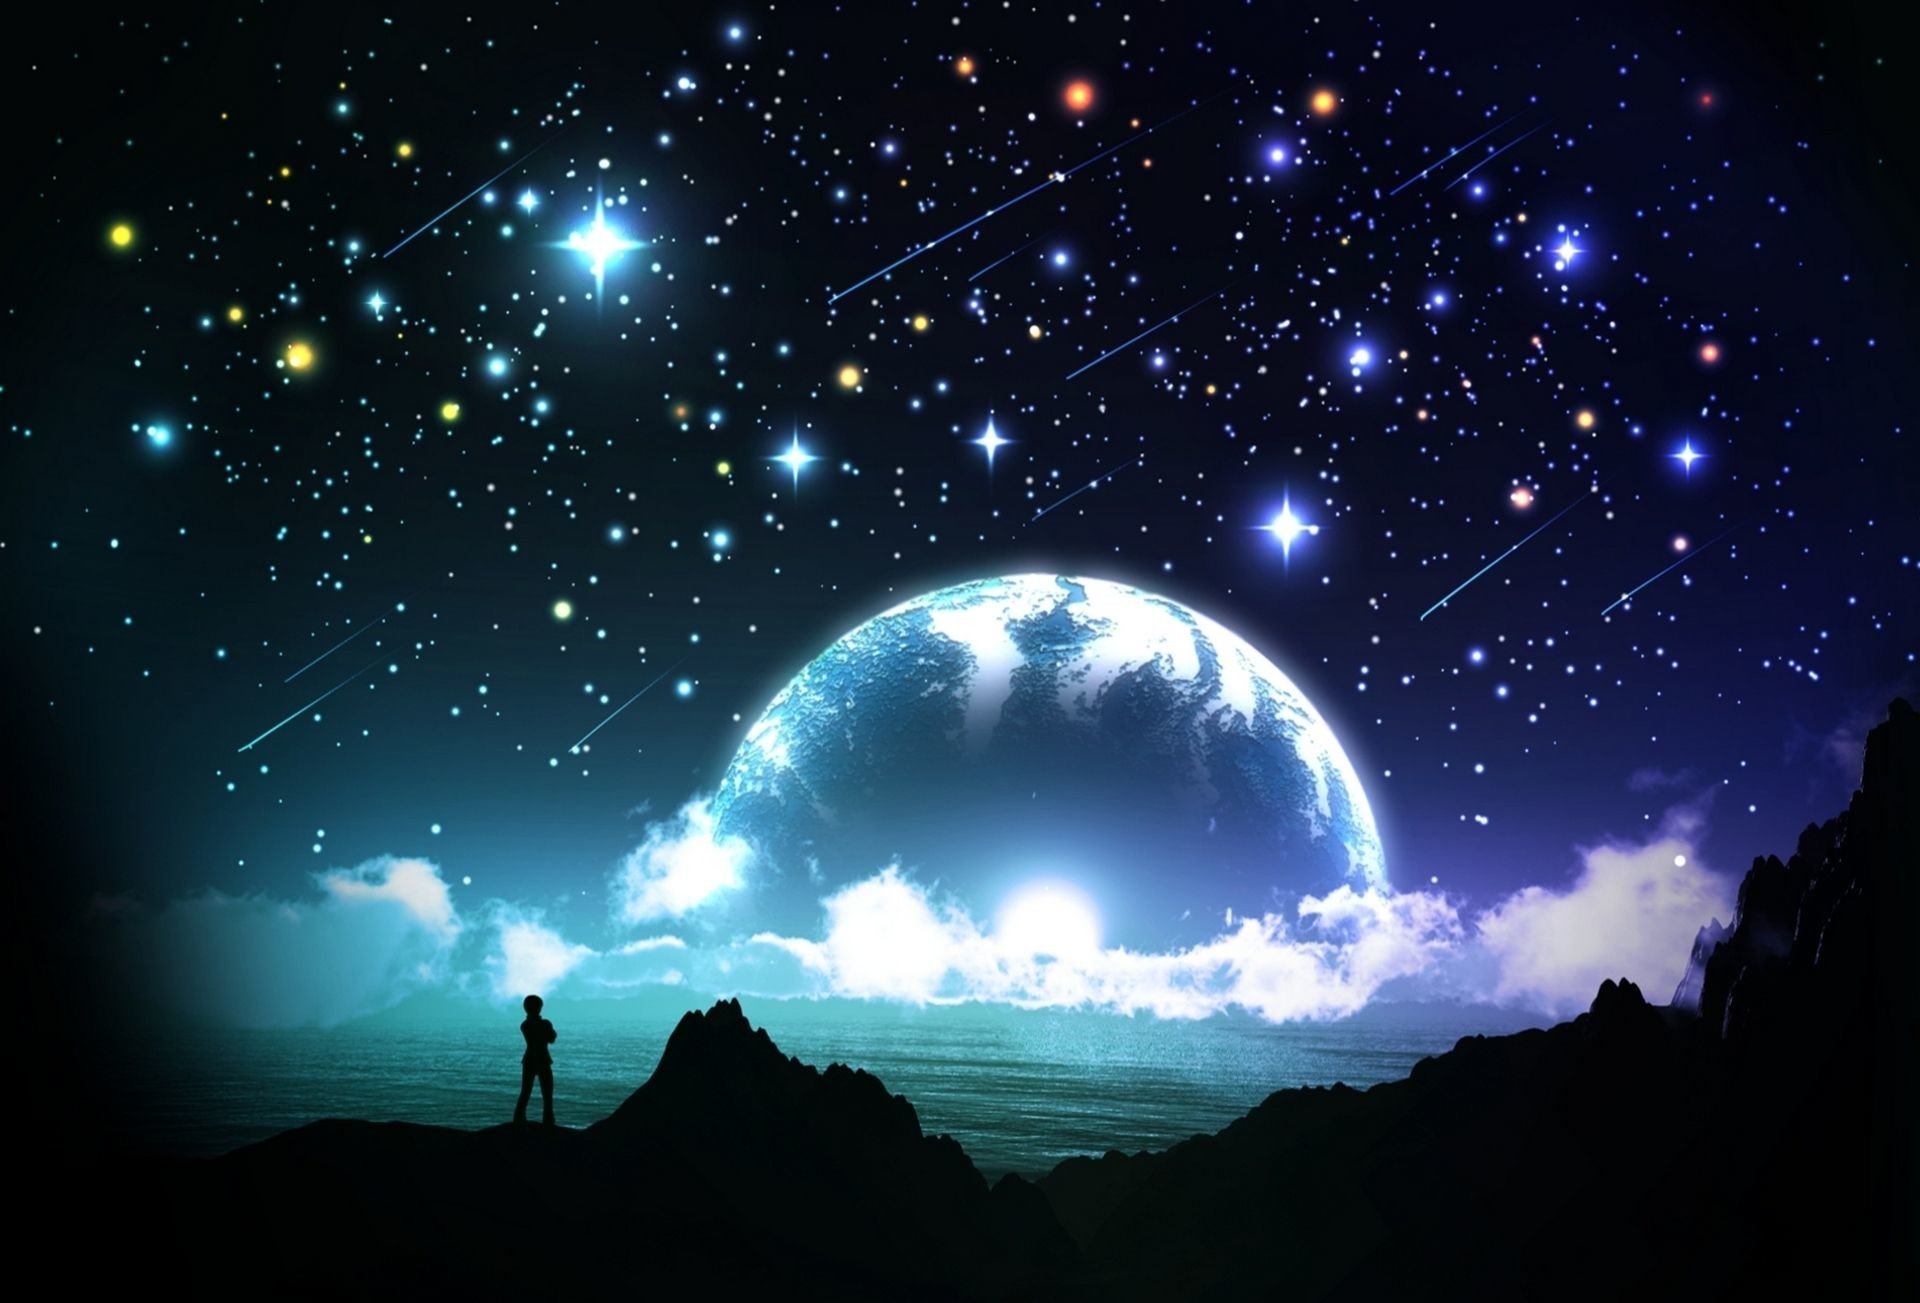 pin Night Sky clipart star hd #7